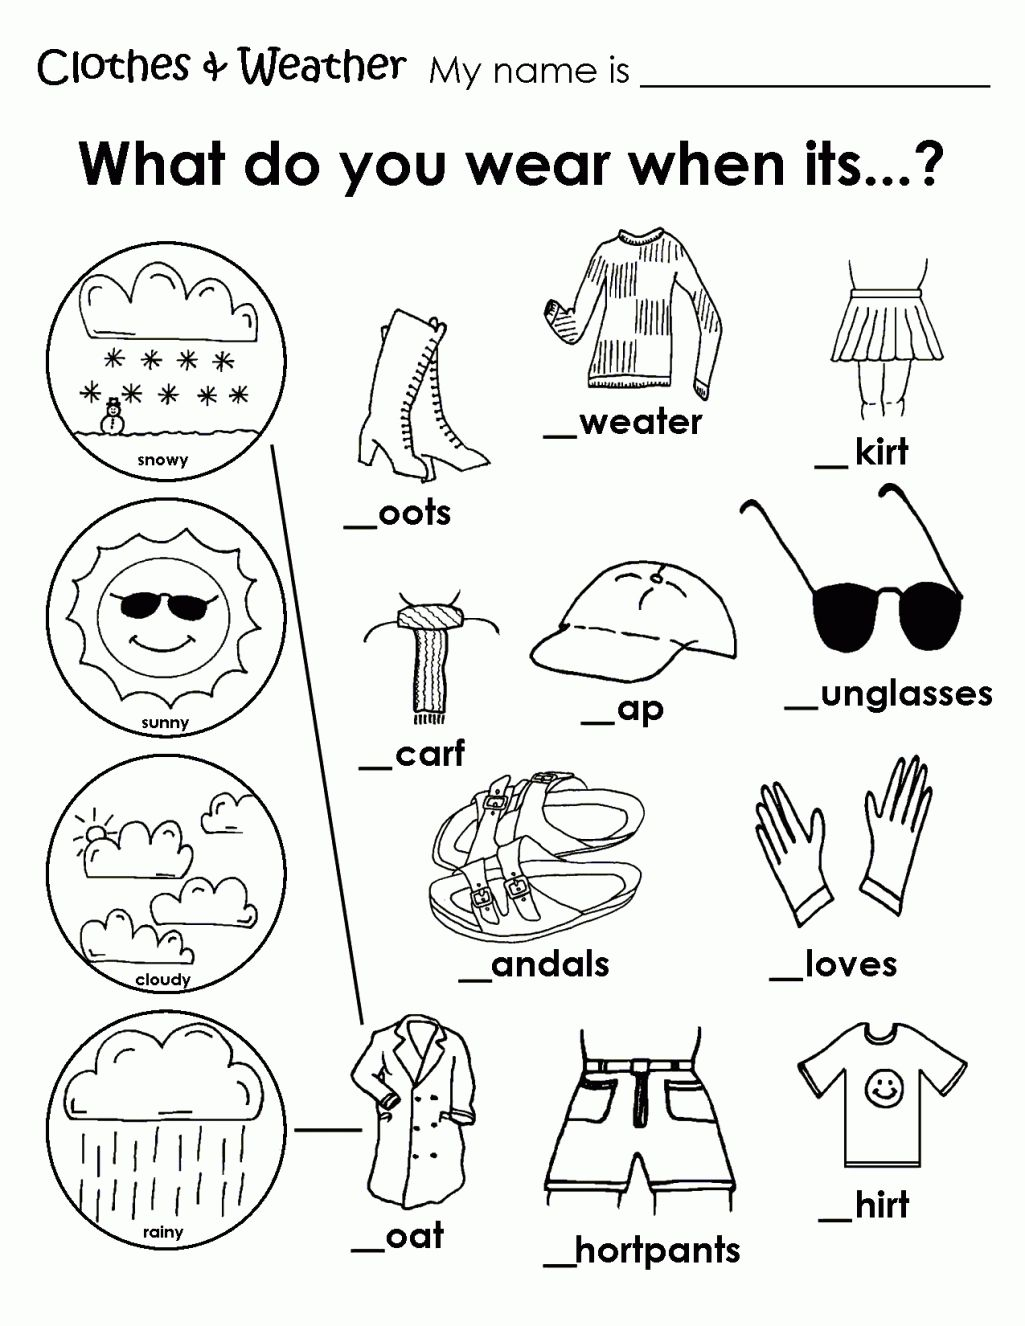 Printable Weather Clothes Worksheet   Hojas de inglés para niños [ 1326 x 1025 Pixel ]